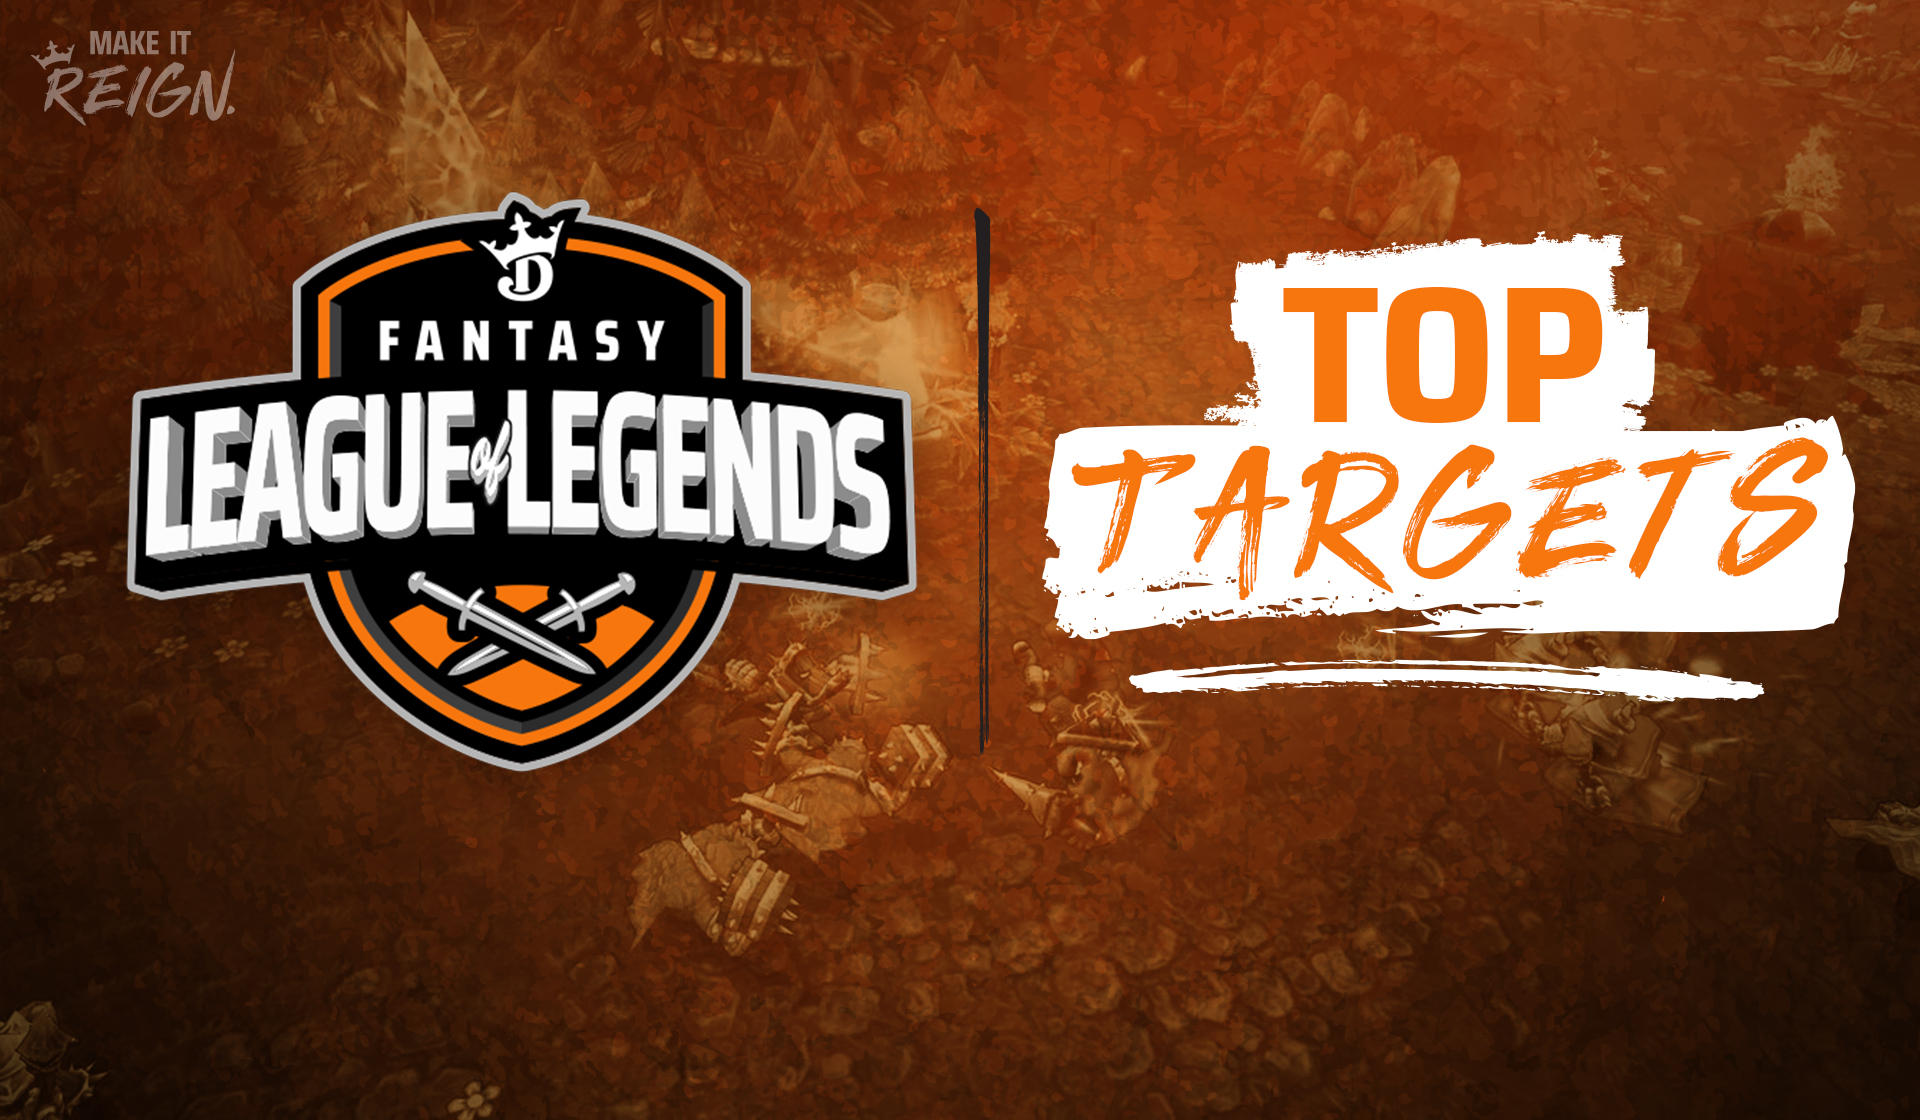 League of Legends orange